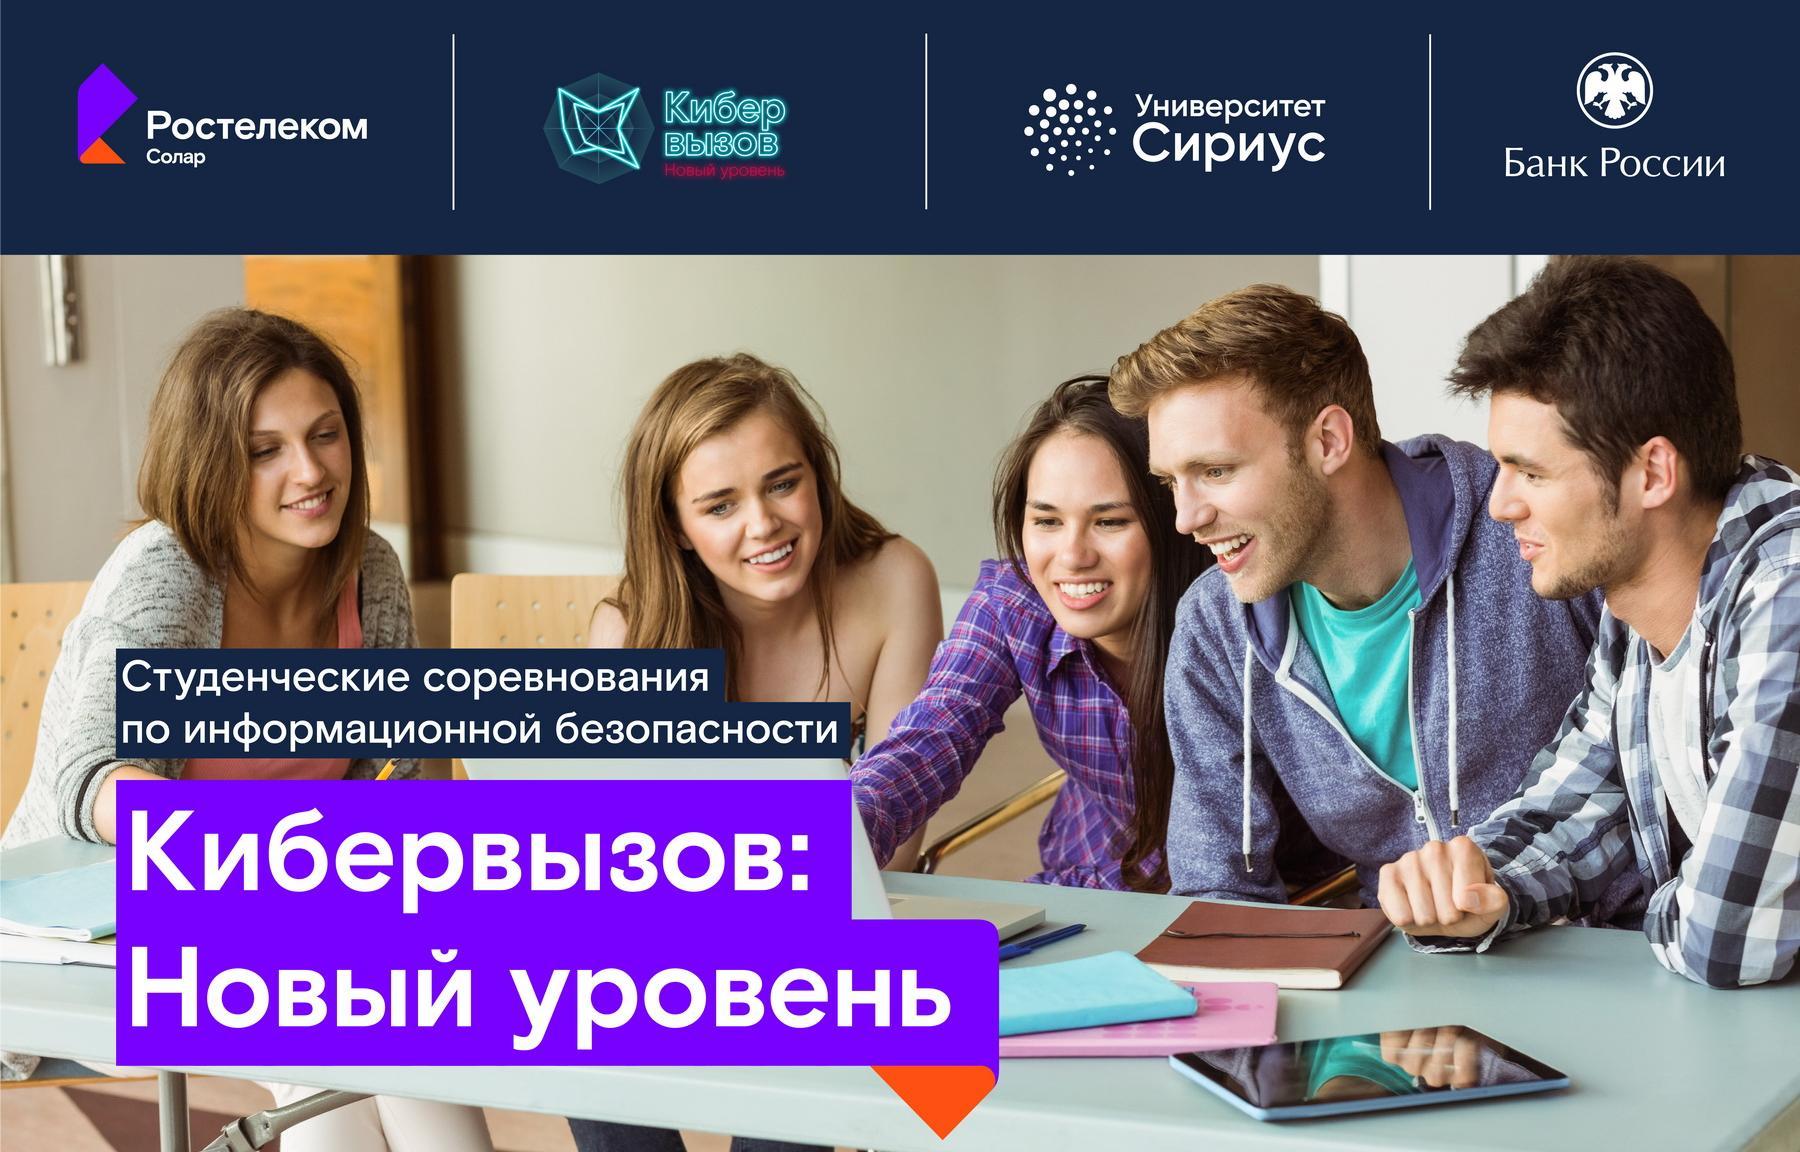 «Ростелеком» объявляет набор на программу по кибербезопасности в научно-технический университет «Сириус» - новости Афанасий